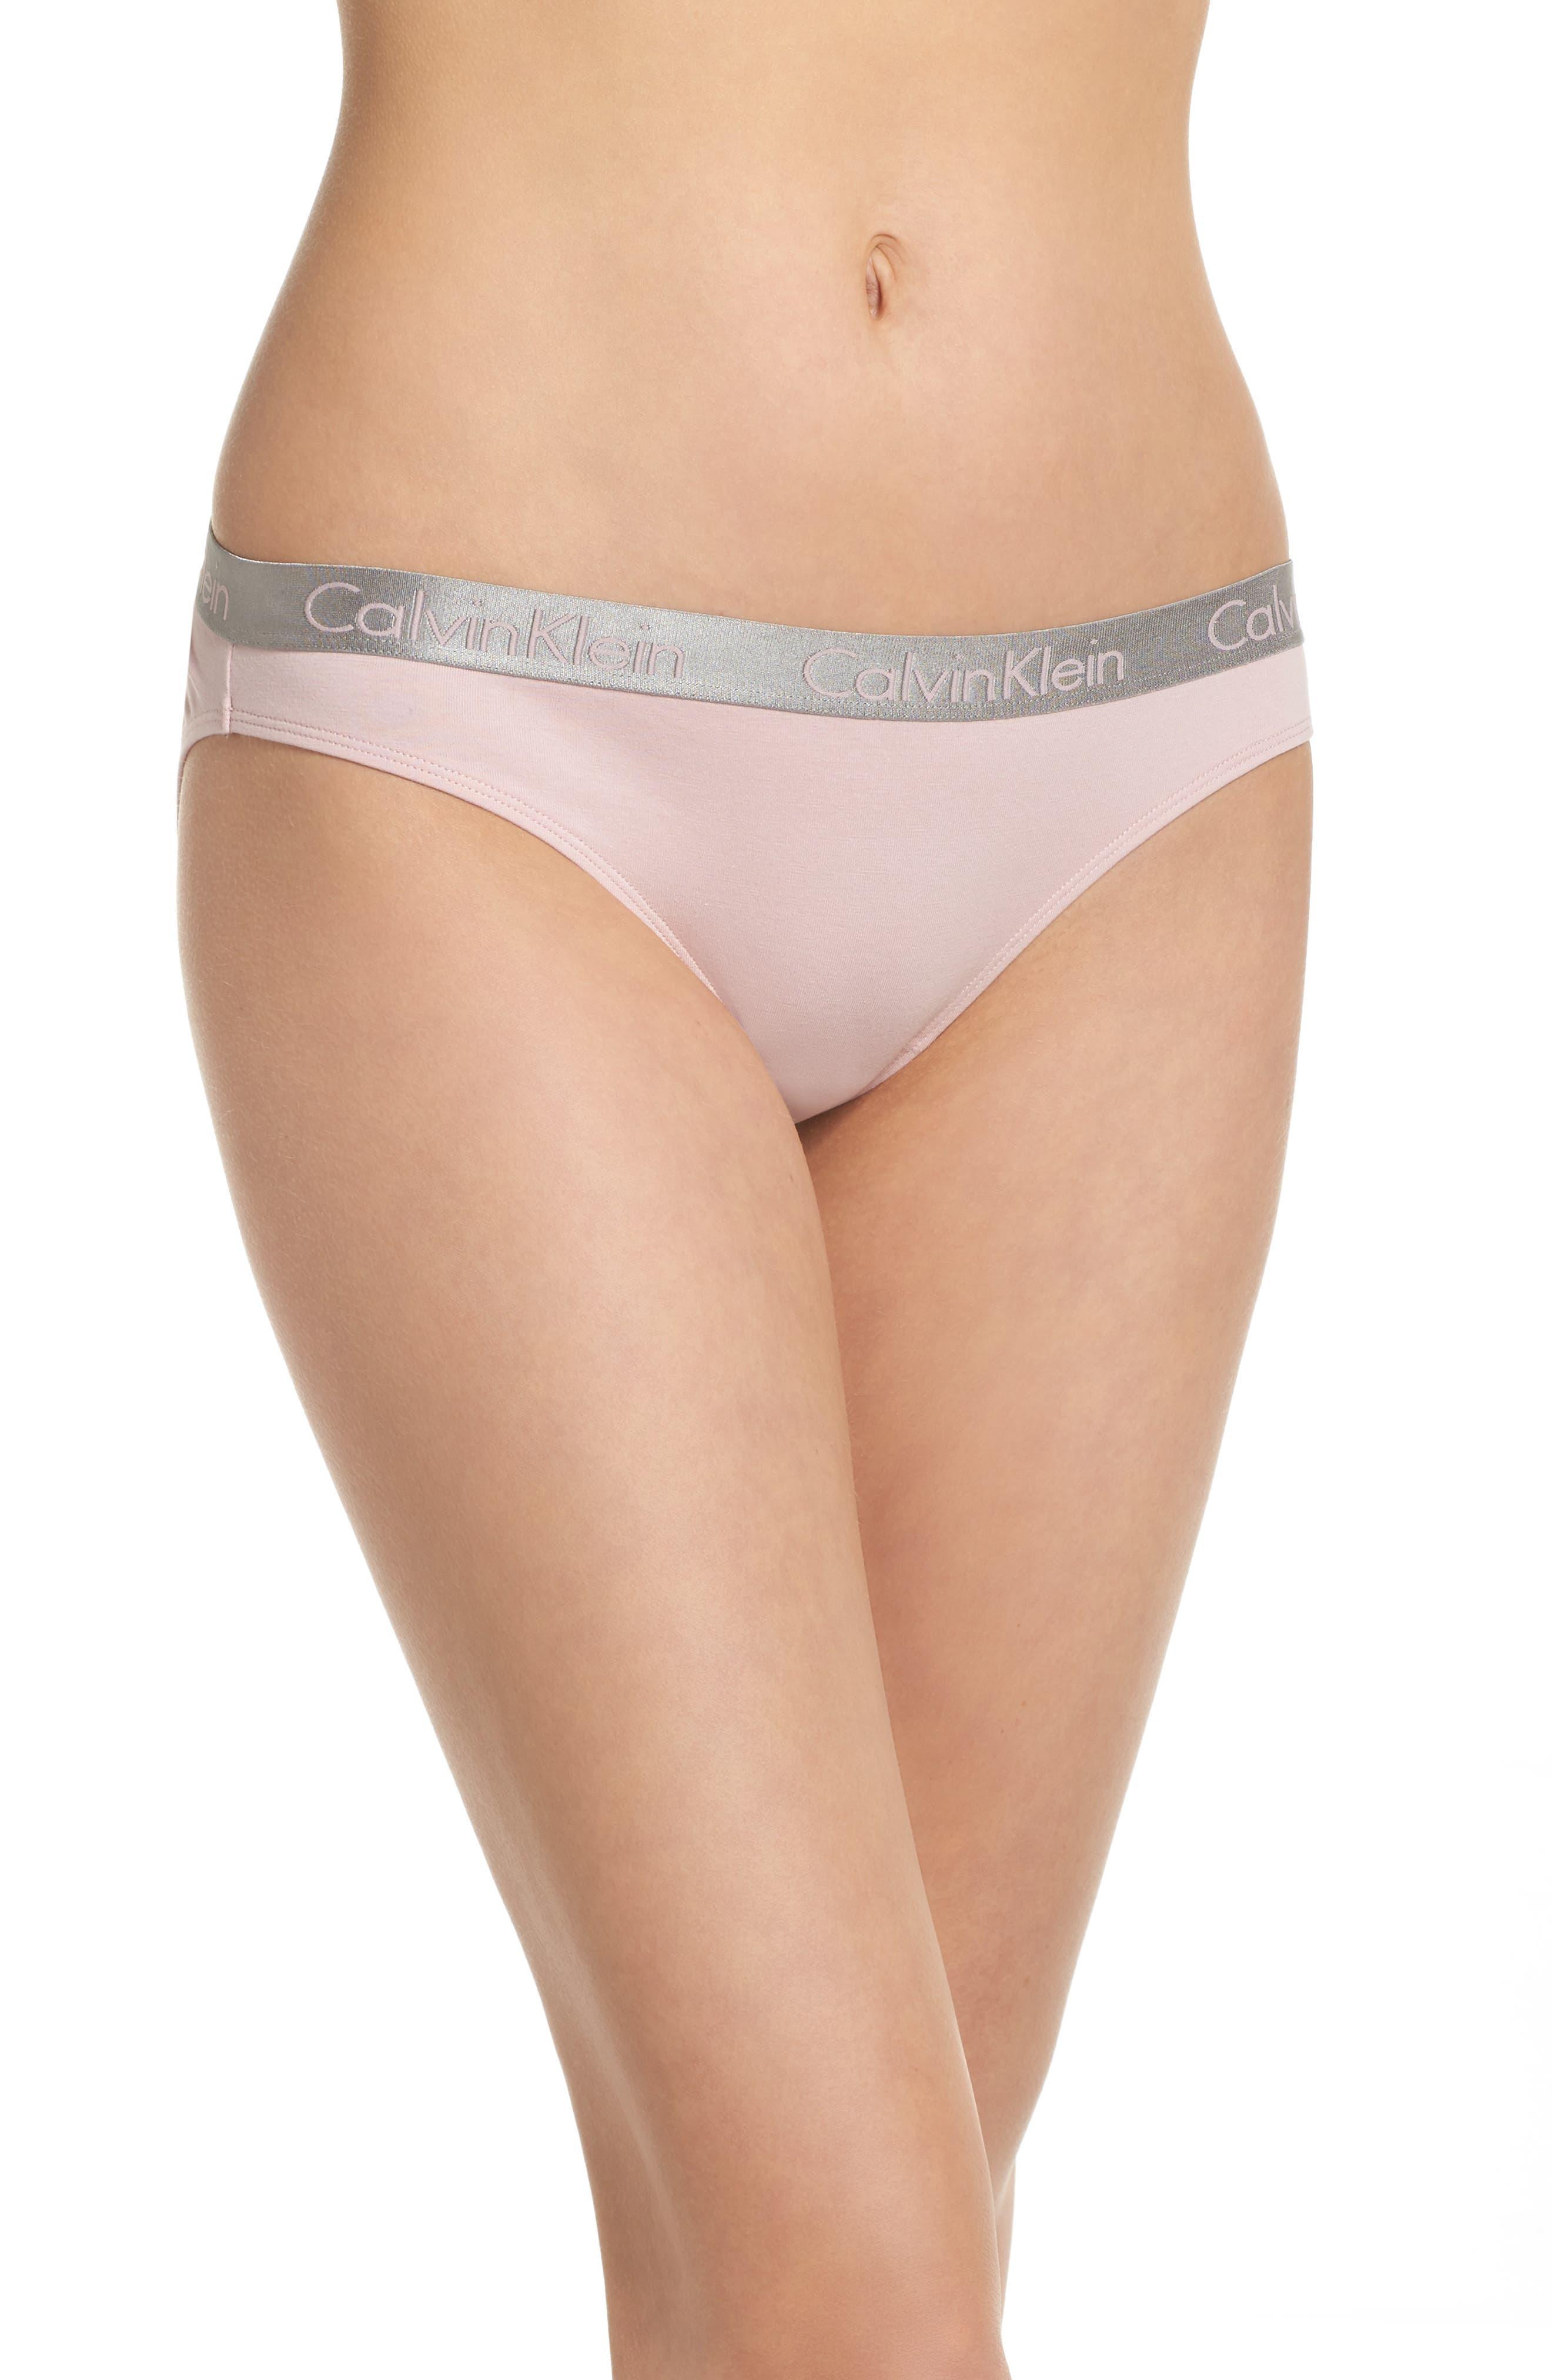 Alternate Image 1 Selected - Calvin Klein 'Radiant' Cotton Bikini (3 for $33)